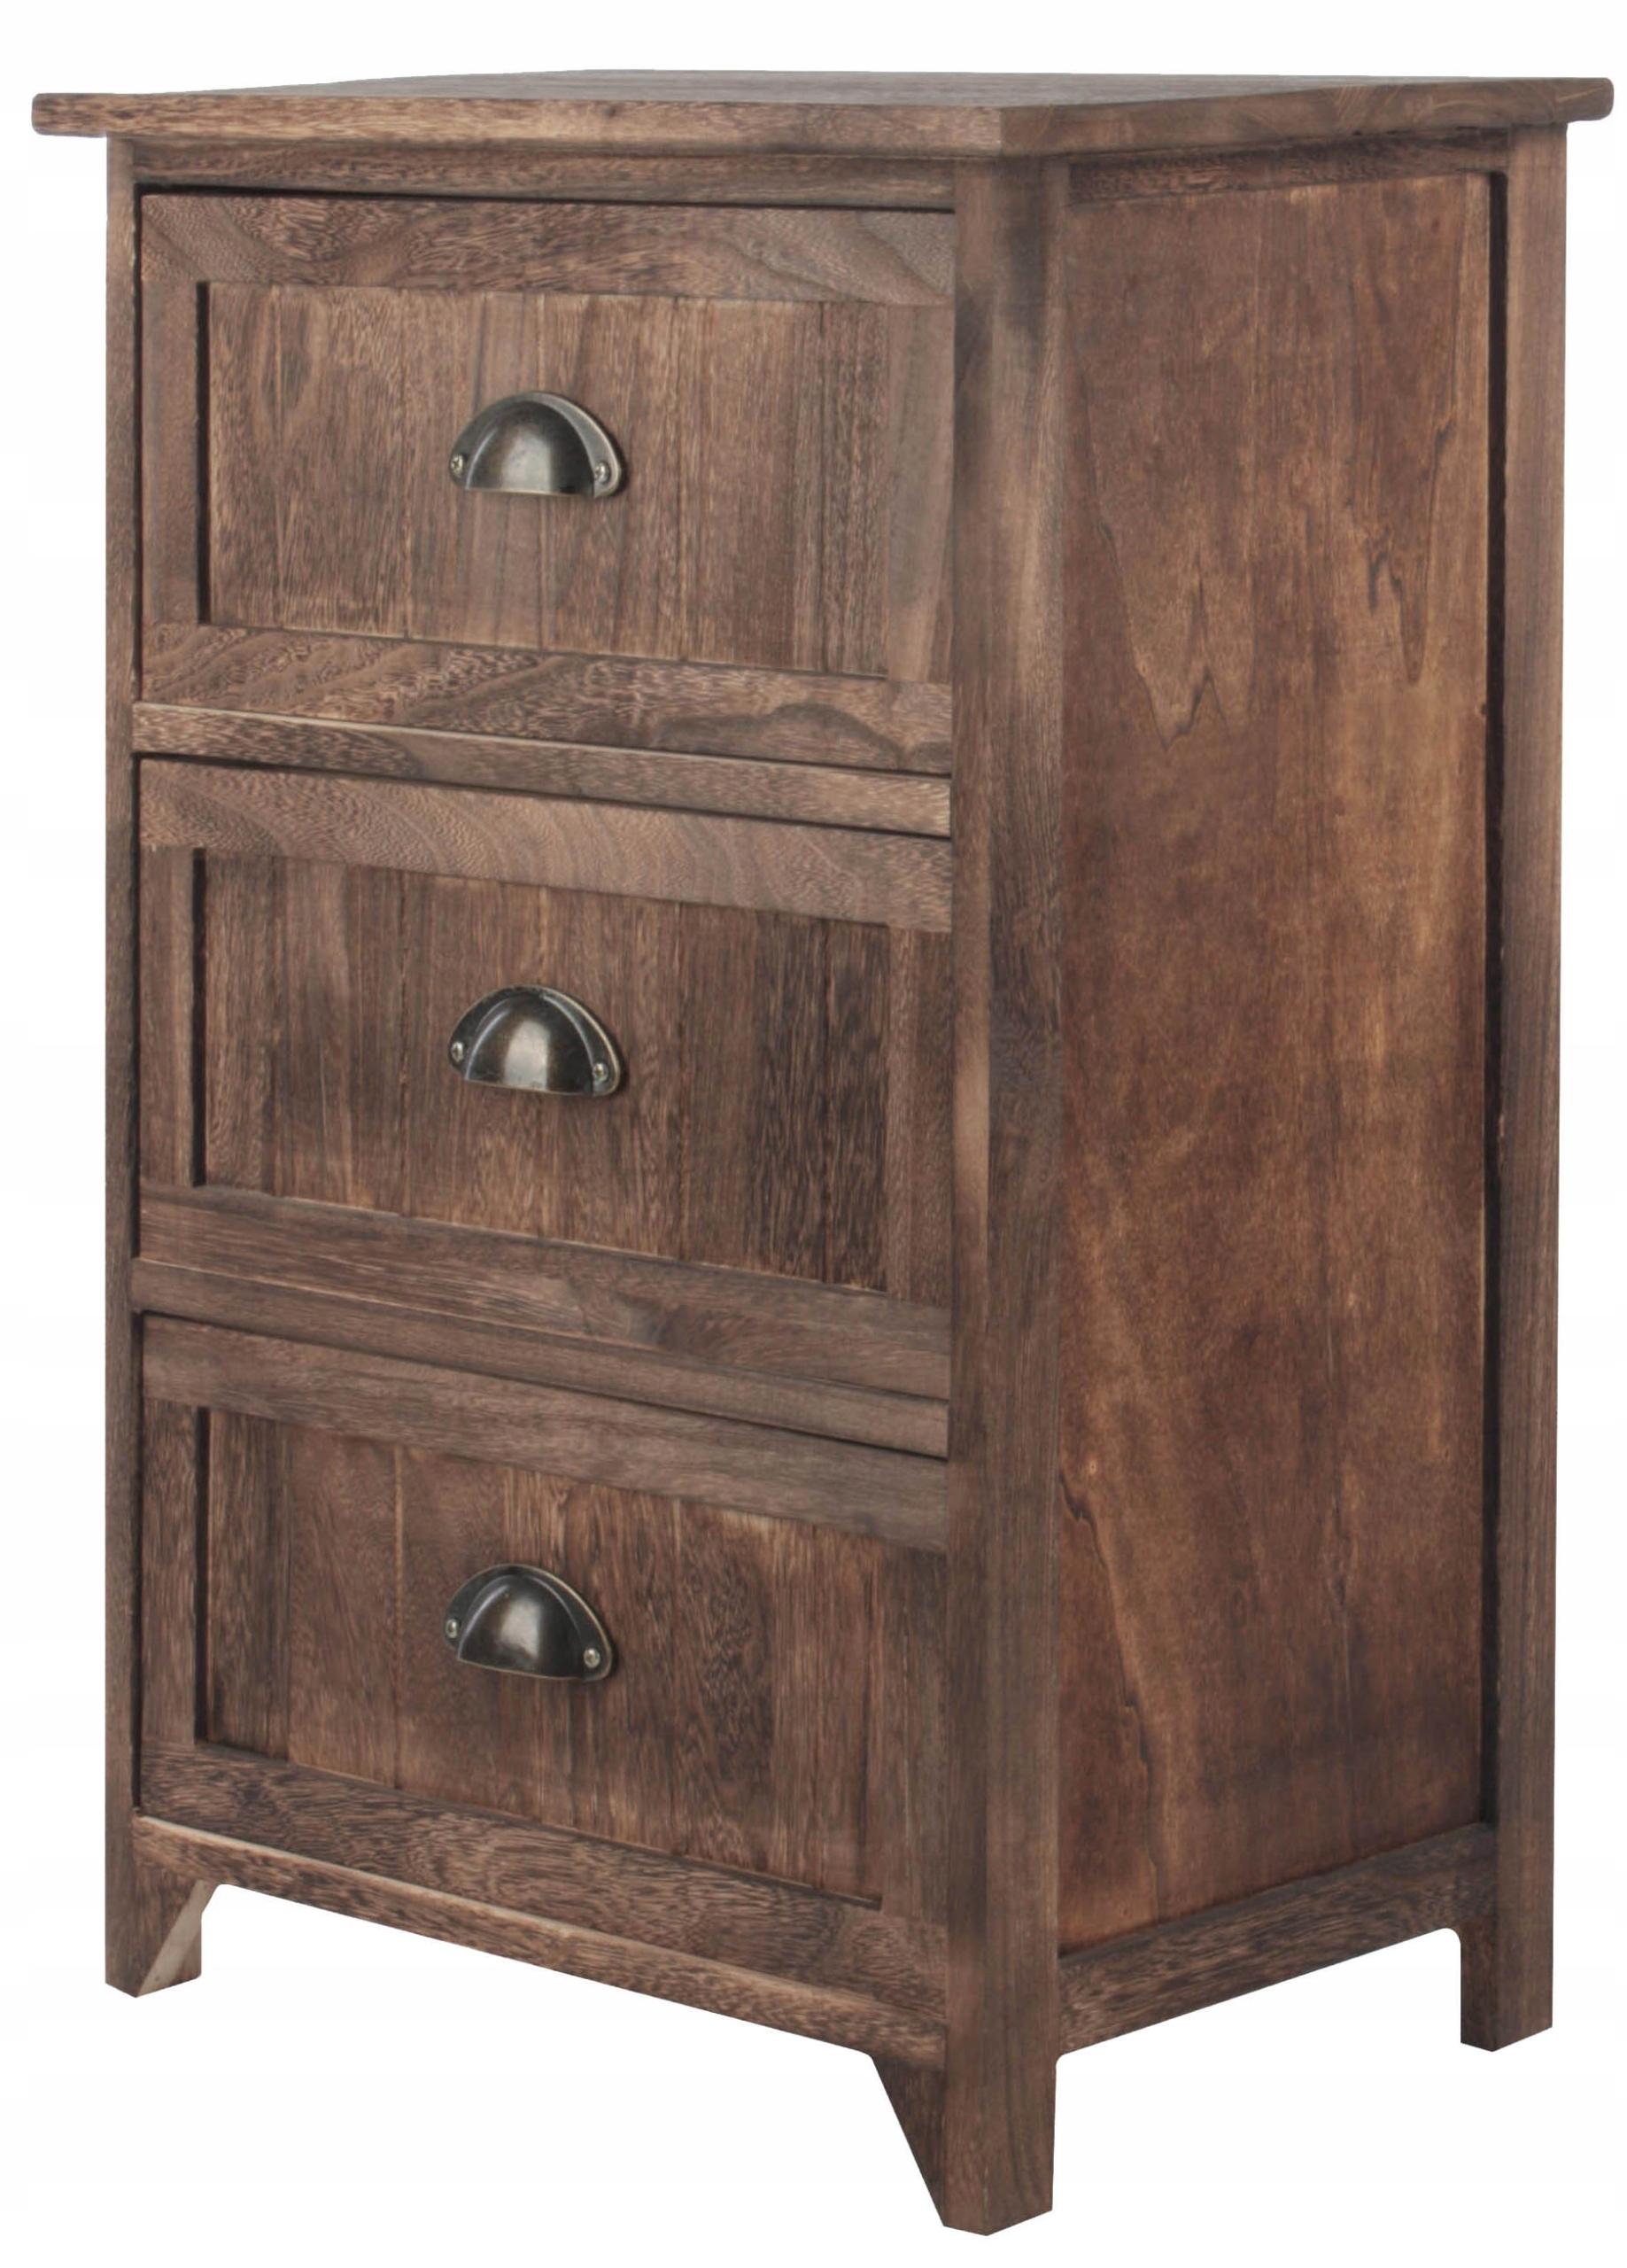 K60 nočnom stolíku NOČNÝ stolík toaletný stolík VINTAGE BROWN